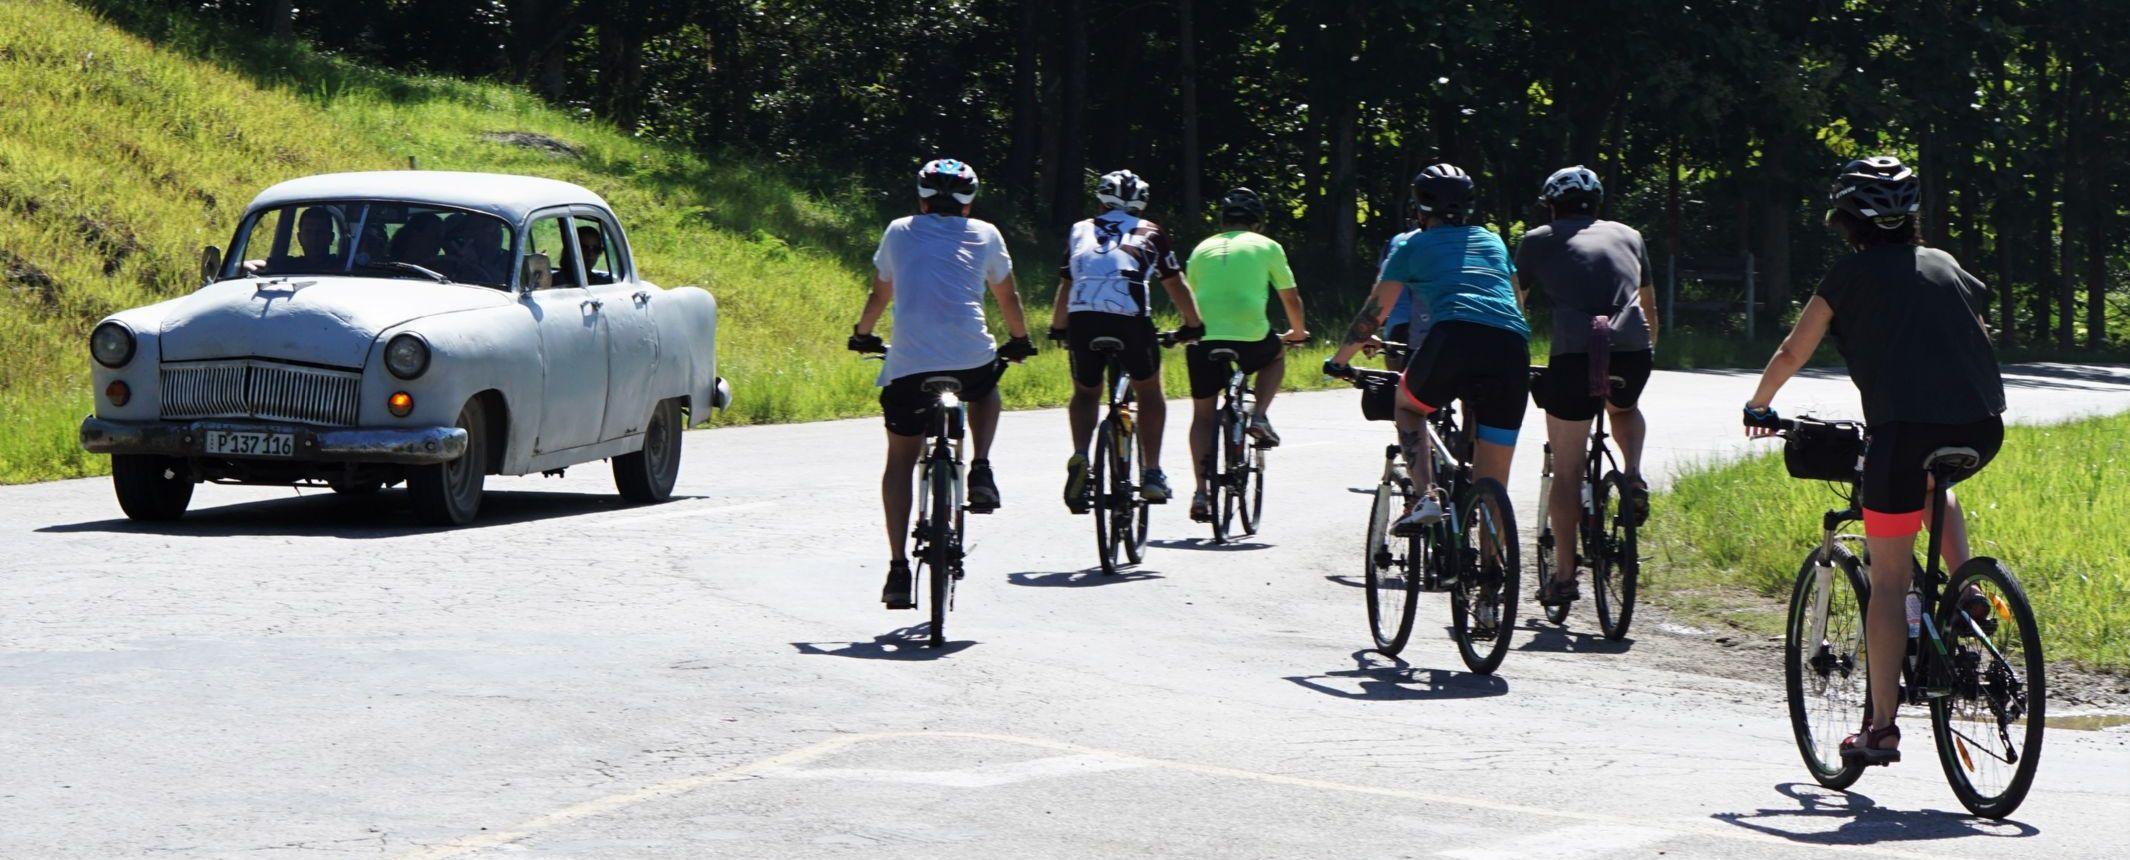 Cuba - Descubriendo Cuba en bicicleta